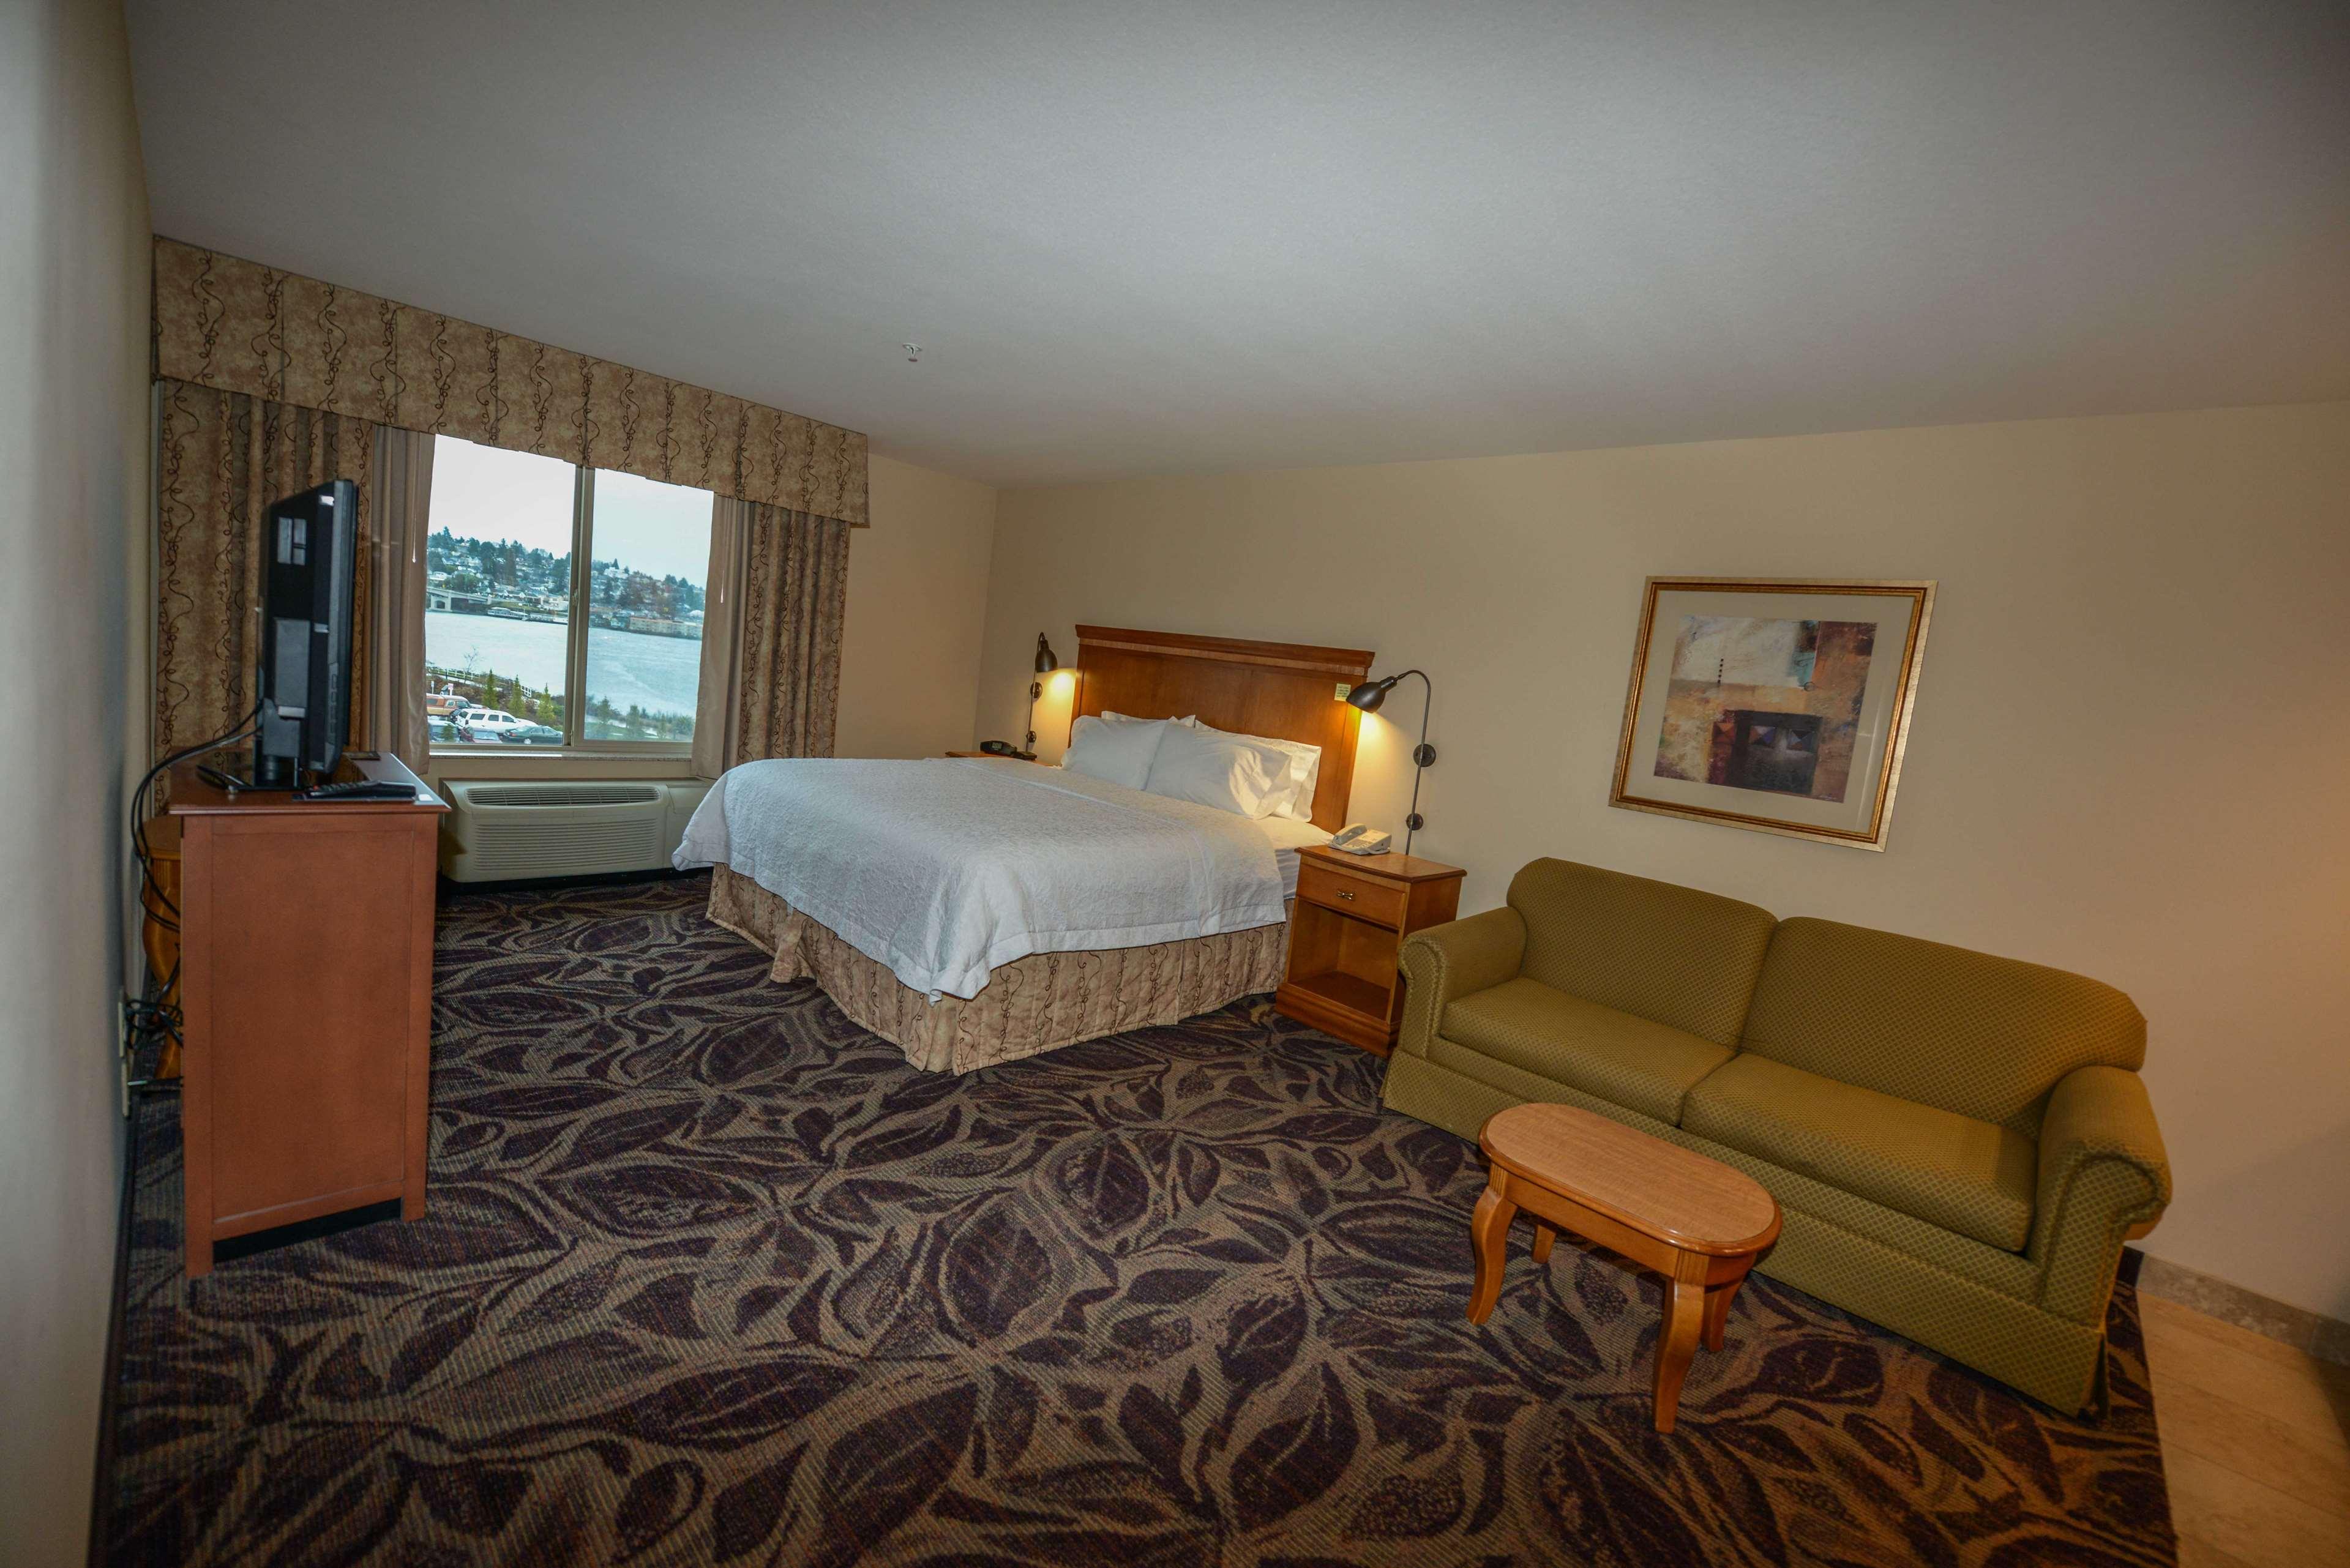 Hampton Inn & Suites Bremerton image 26